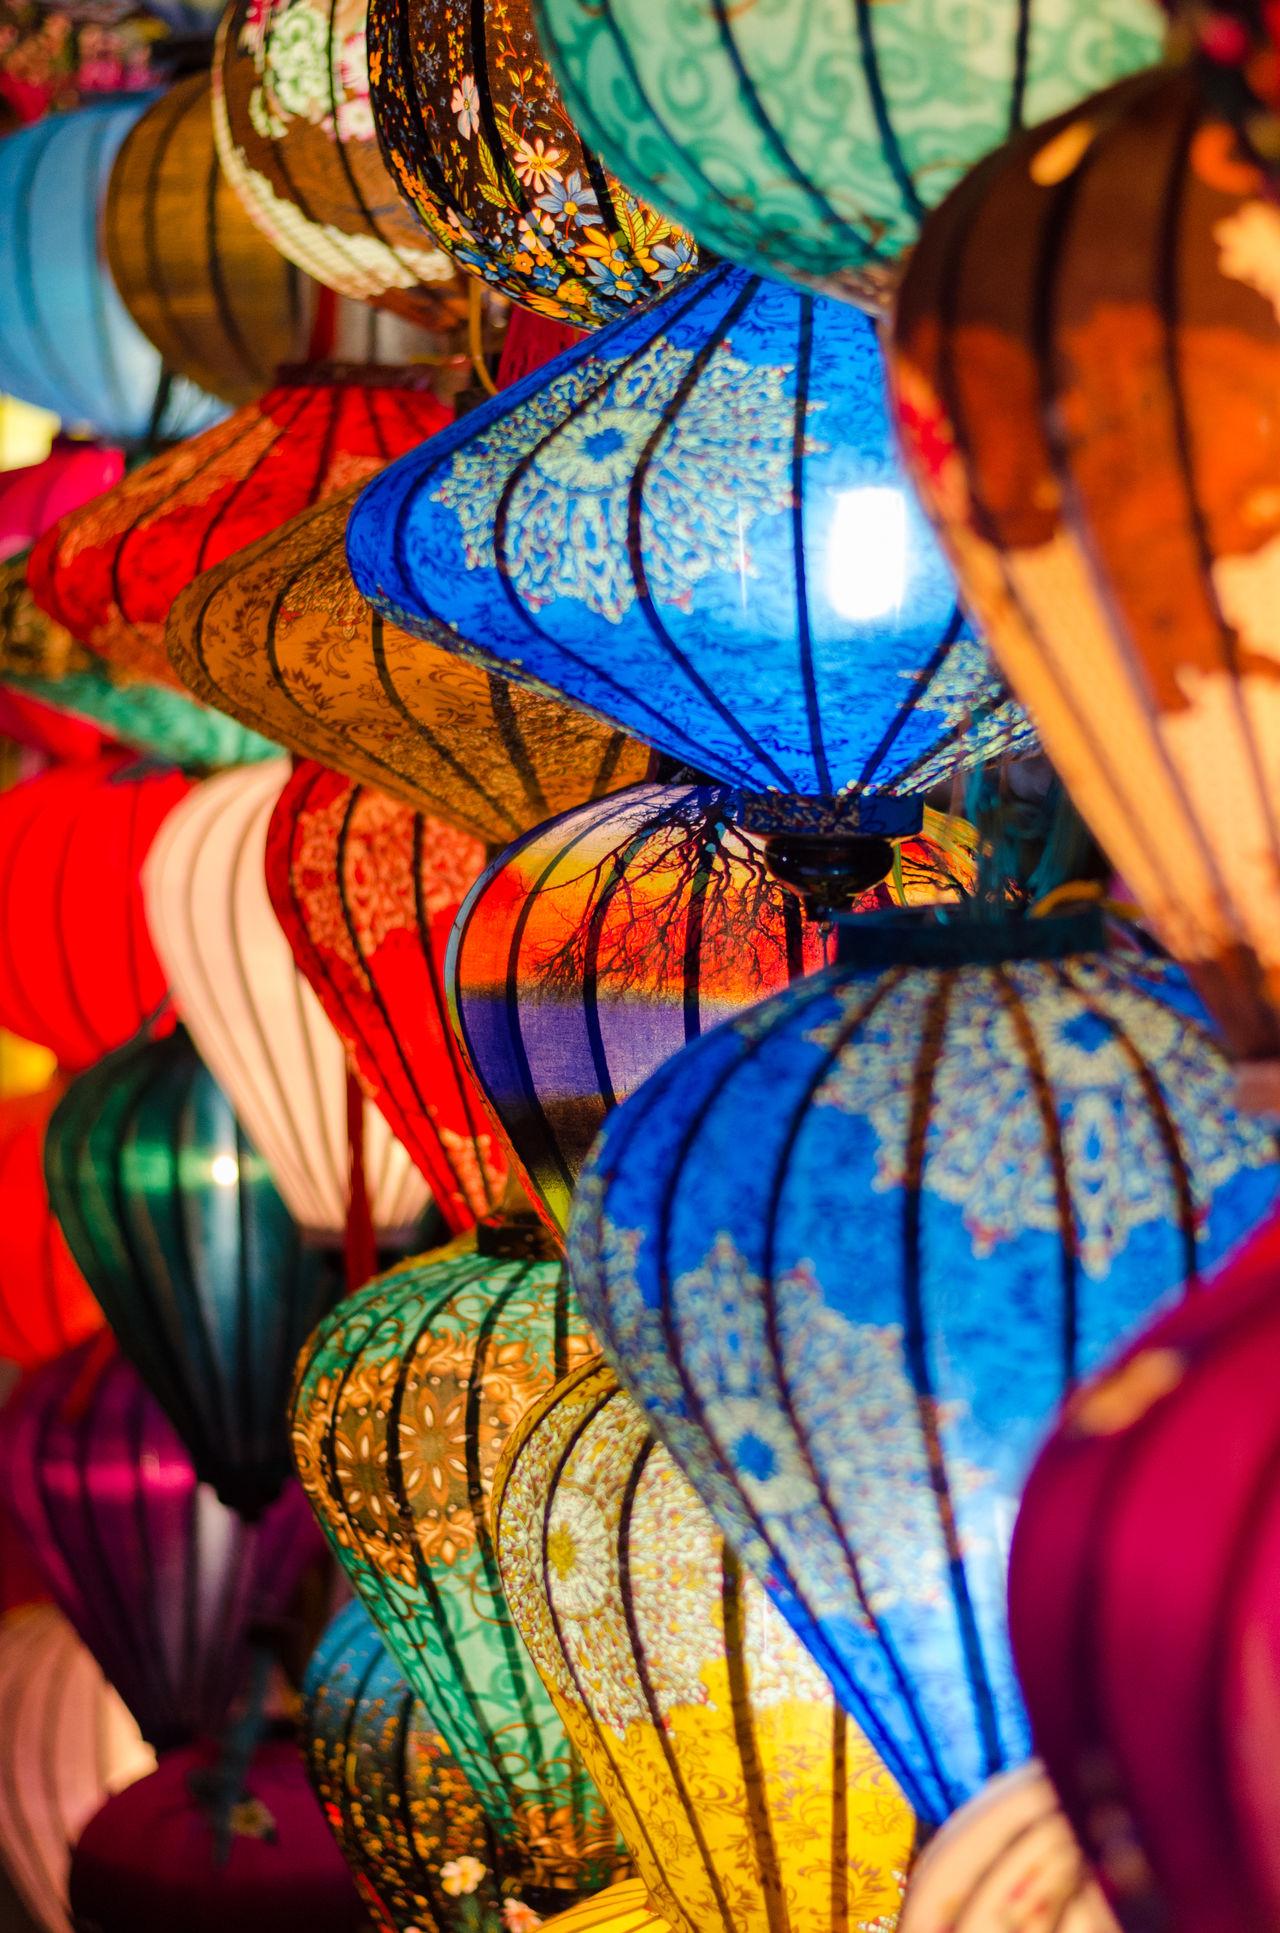 Multi Colored Travel Destinations Hoian, Vietnam Hoian Old Town HoiAnancienttown Hoi An World Backpacking Reisefotografie Traditional Culture Vietnam Market Nightphotography Nightlights Lampion Light